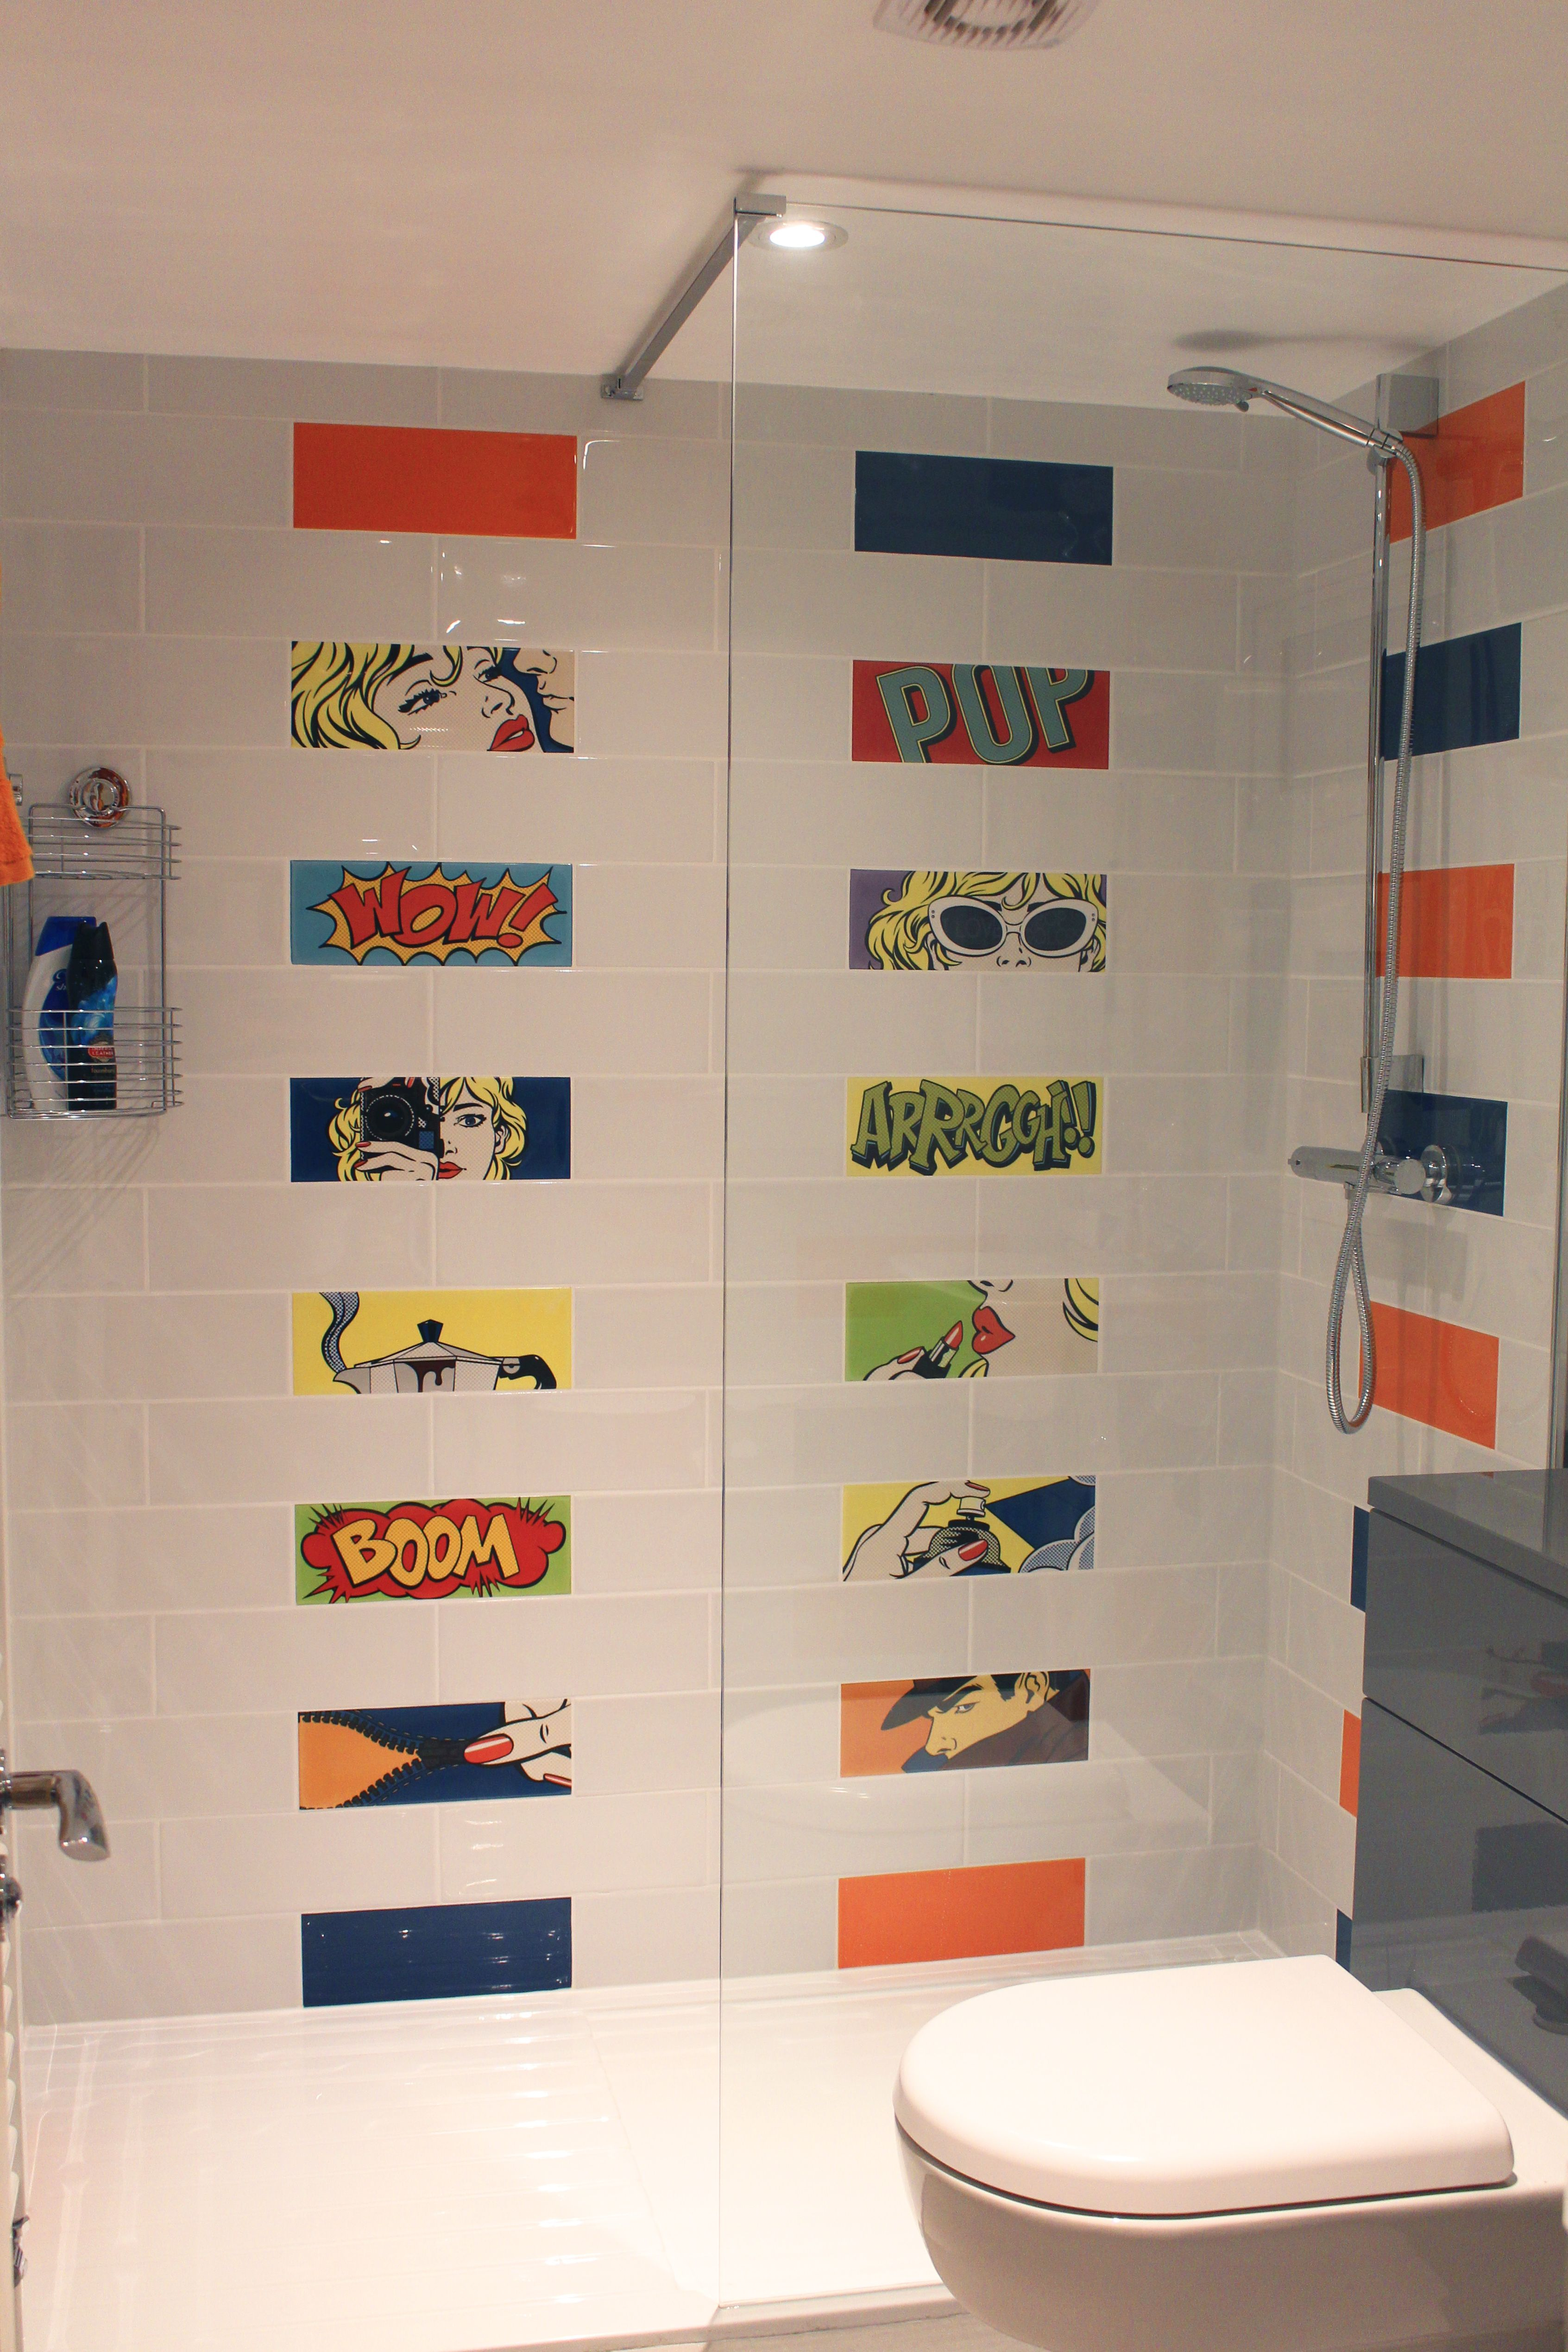 En Suite With Milano Cartoon Decor Mix Blue And Orange Tiles Pop